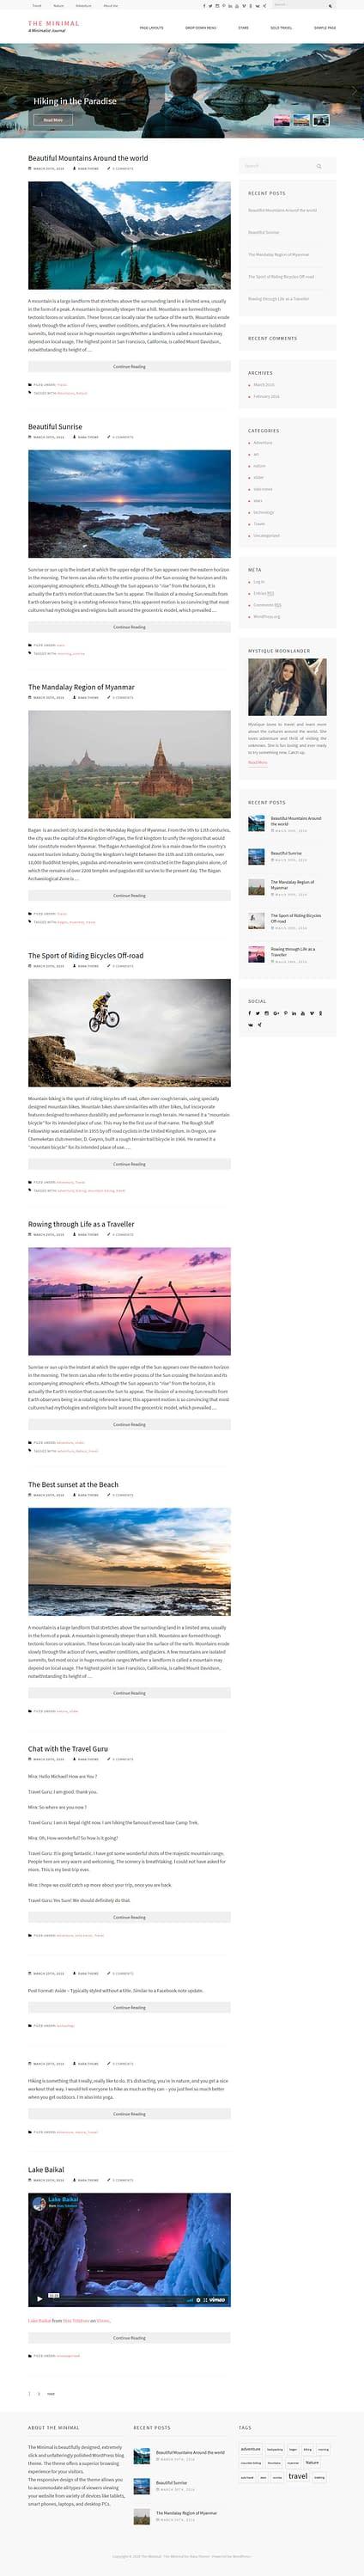 The Minimal - Best Free Minimal WordPress Theme